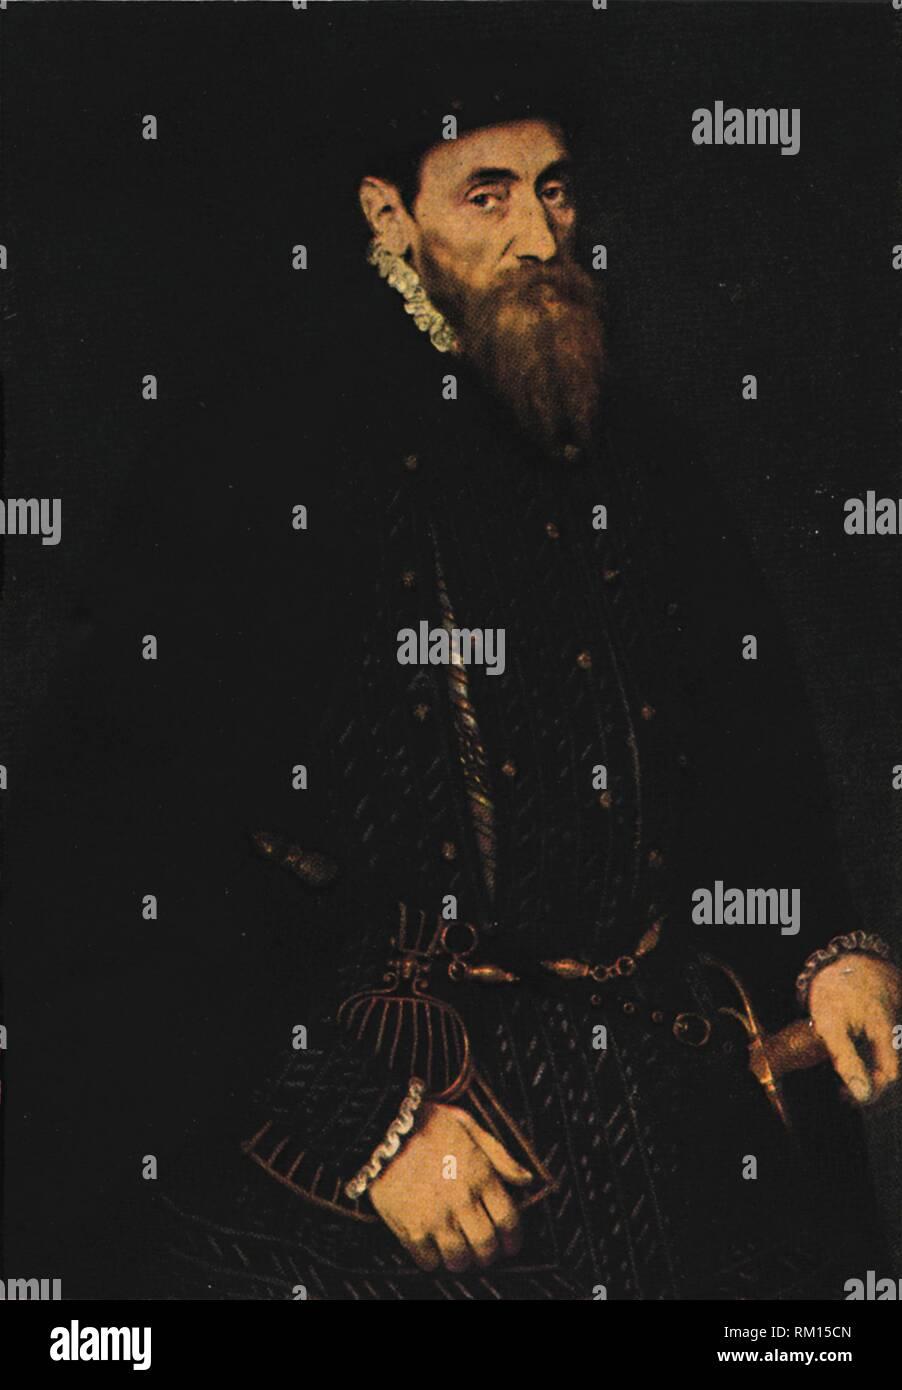 "'Pathfinders - Sir Thomas Gresham', c1565, (1922). Portrait of English merchant and financier Sir Thomas Gresham (c1519-1579), founder of the Royal Exchange in London. From ""Bibby's Annual 1922"", edited by Joseph Bibby. [J. Bibby & Sons, London, 1922] - Stock Image"